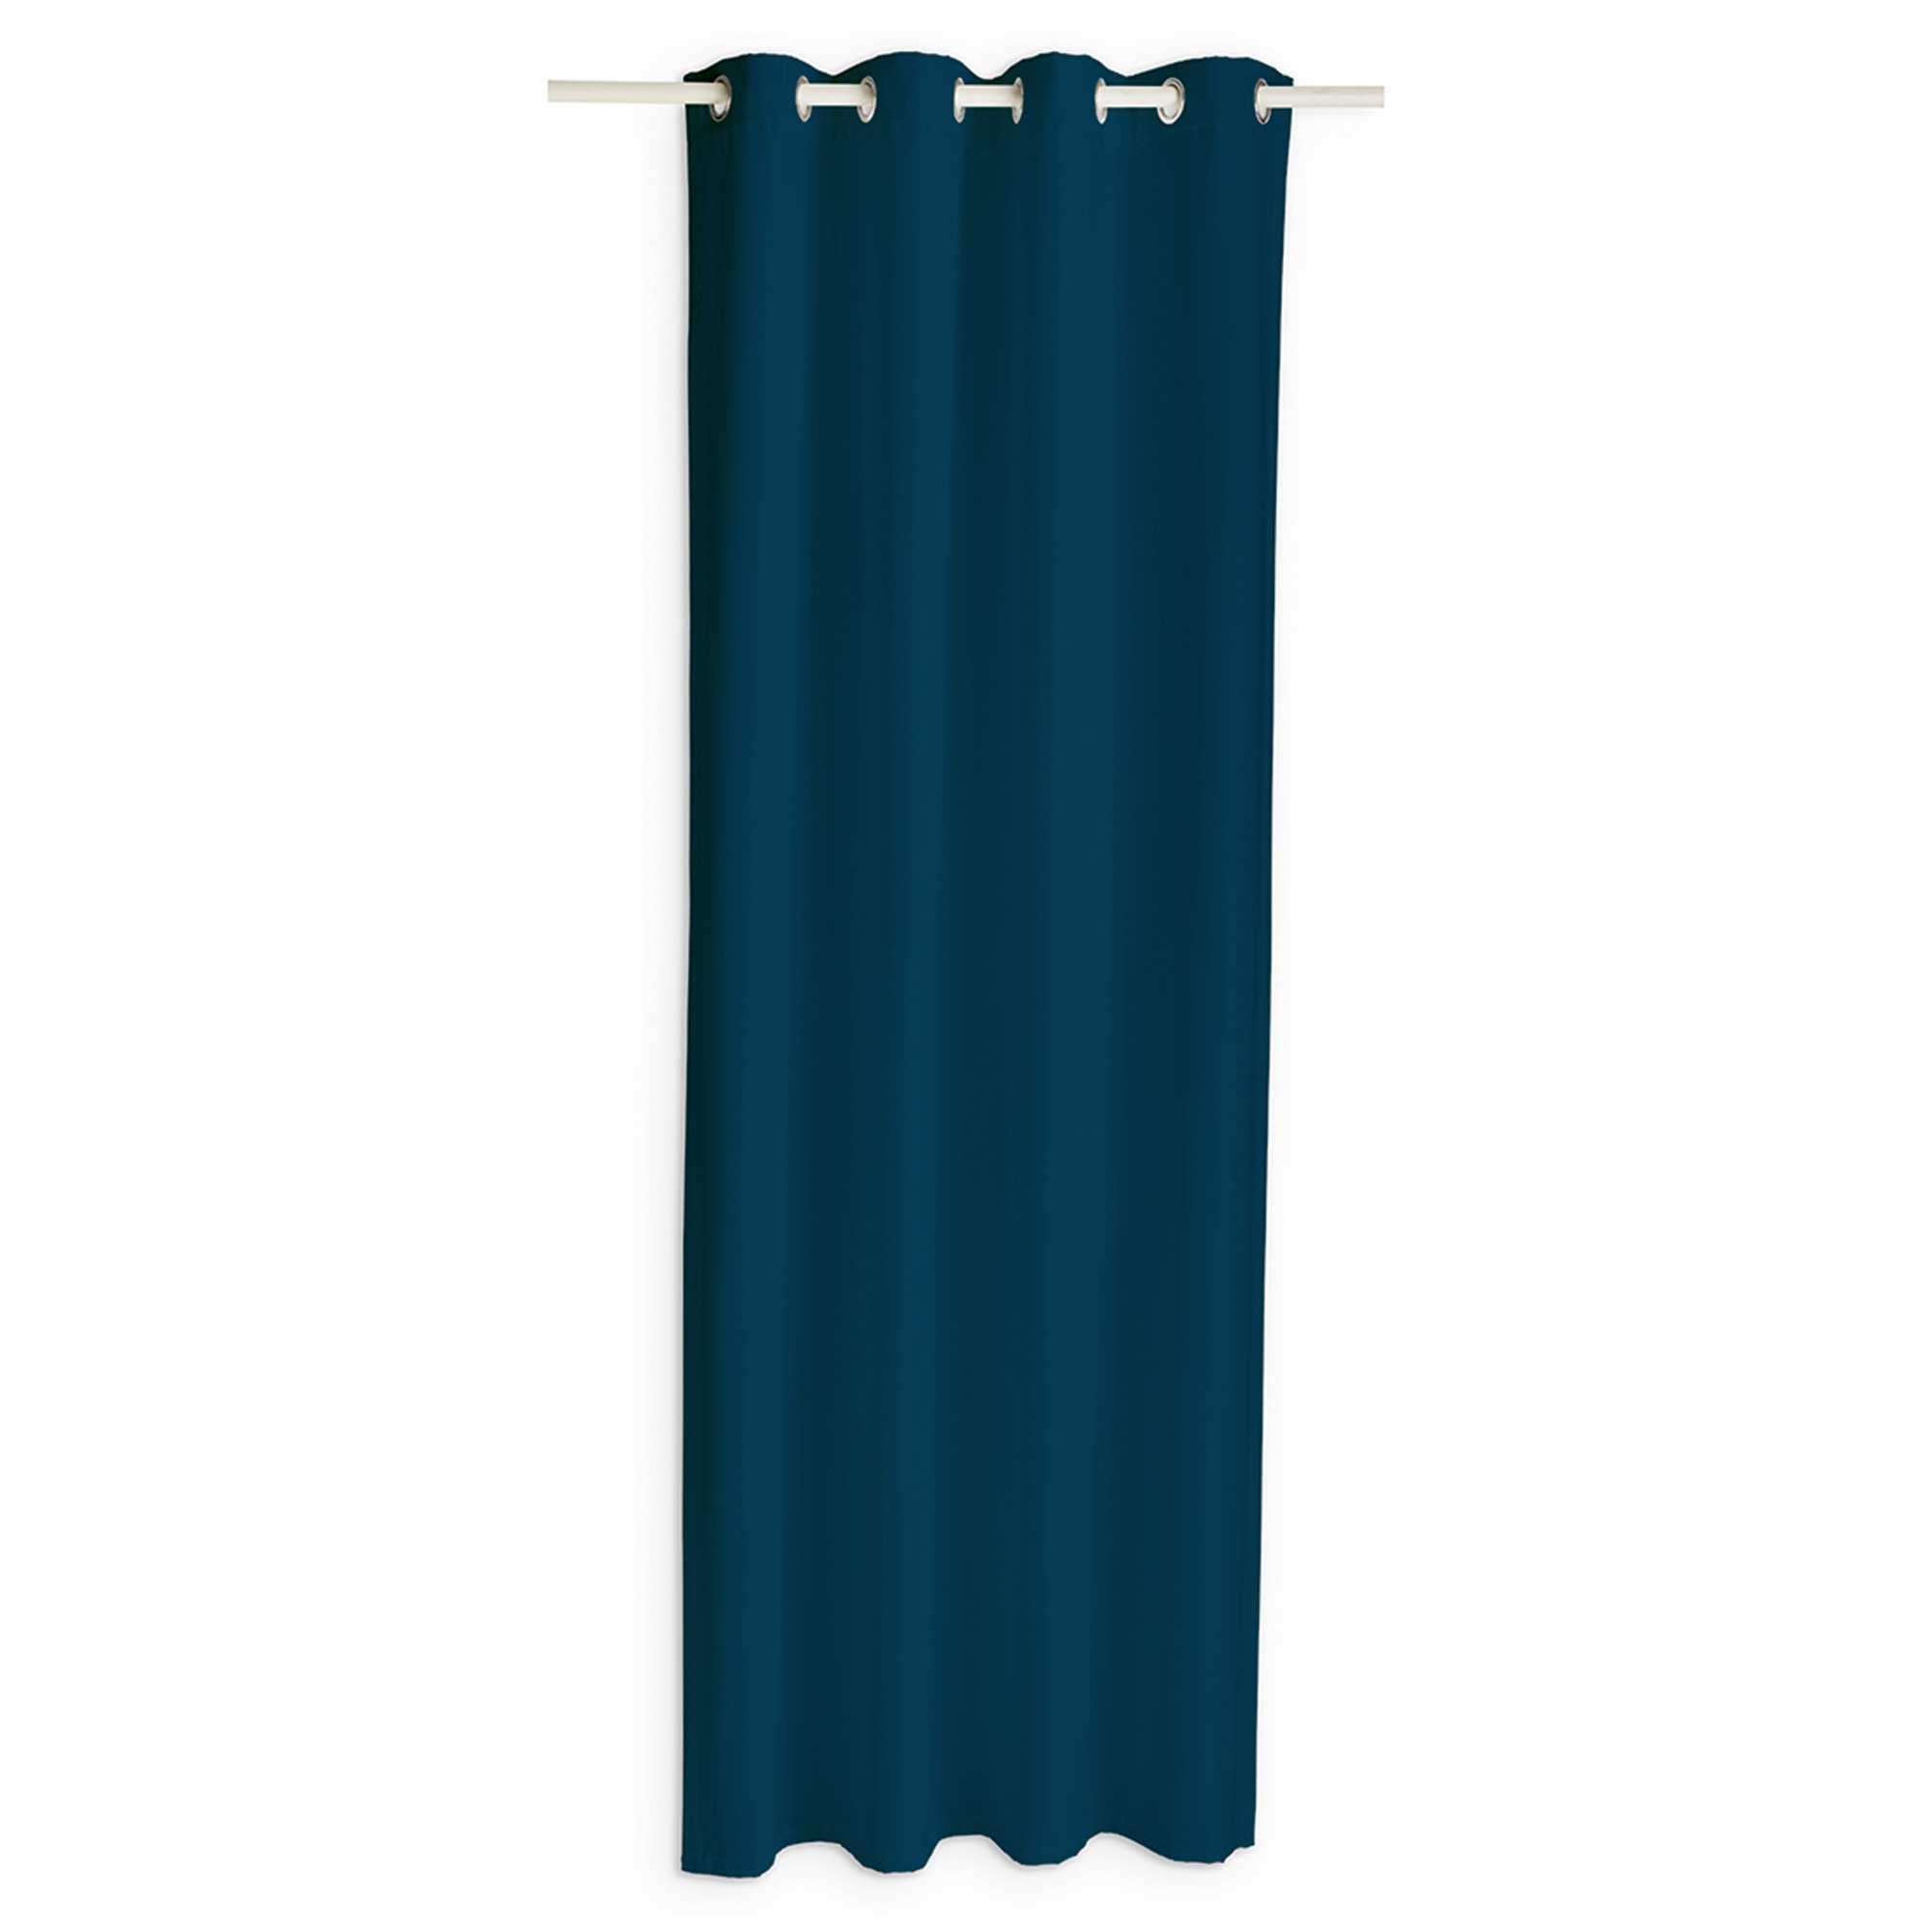 rideau occultant linge de lit bleu marine kiabi 19 99. Black Bedroom Furniture Sets. Home Design Ideas